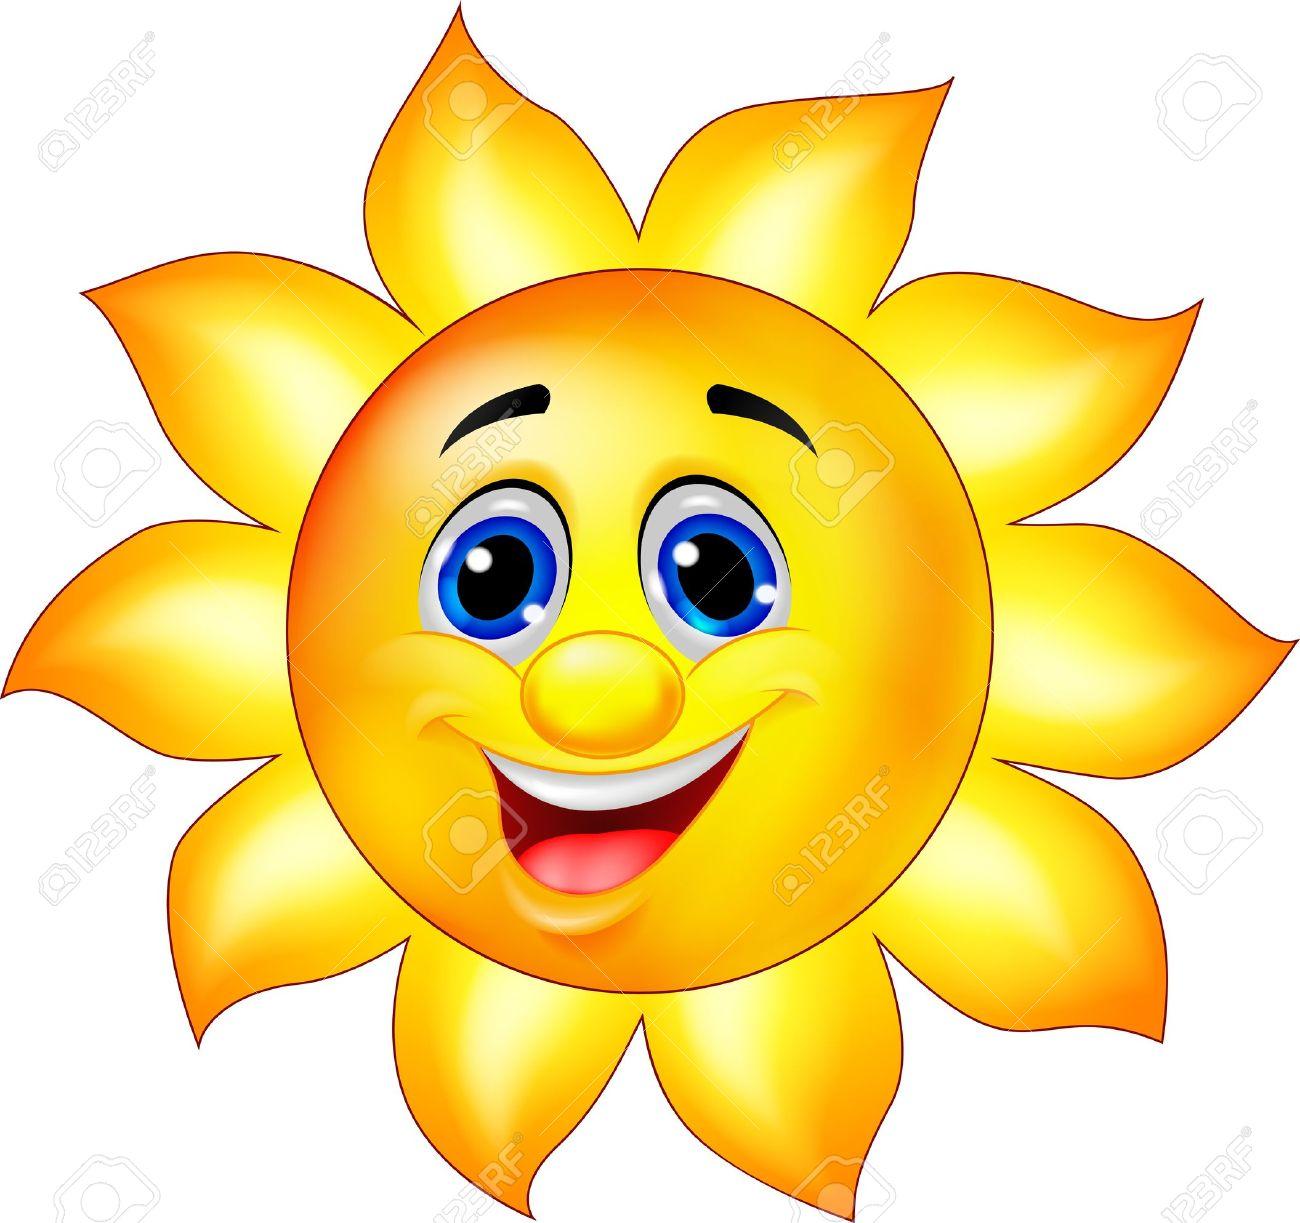 sun cartoon character royalty free cliparts vectors and stock rh 123rf com sun cartoon pictures cartoon sun images download